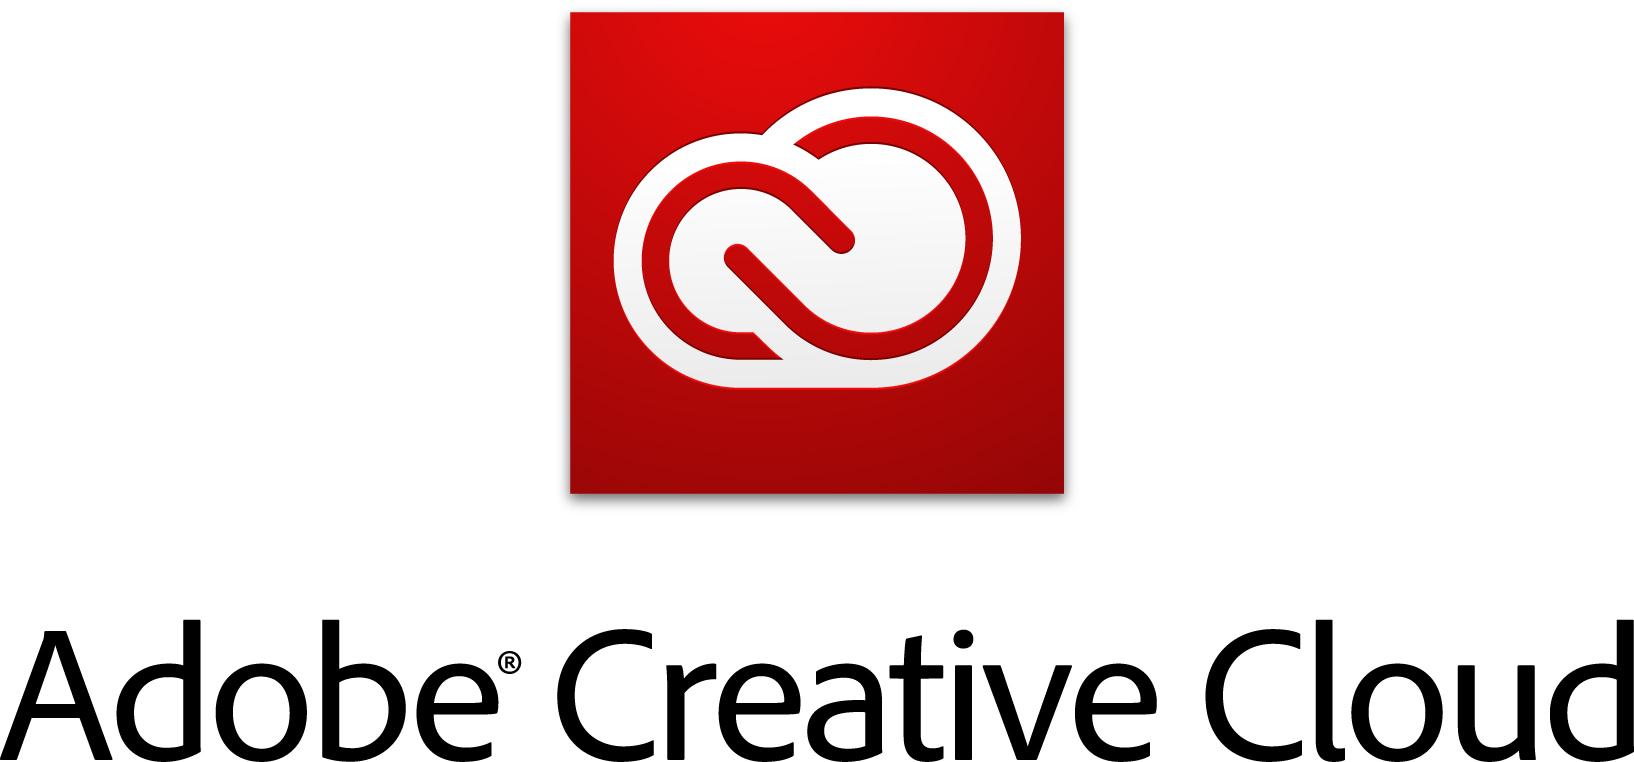 Adobe_Creative_Cloud_logotype_with_mnemonic_RGB_vertical